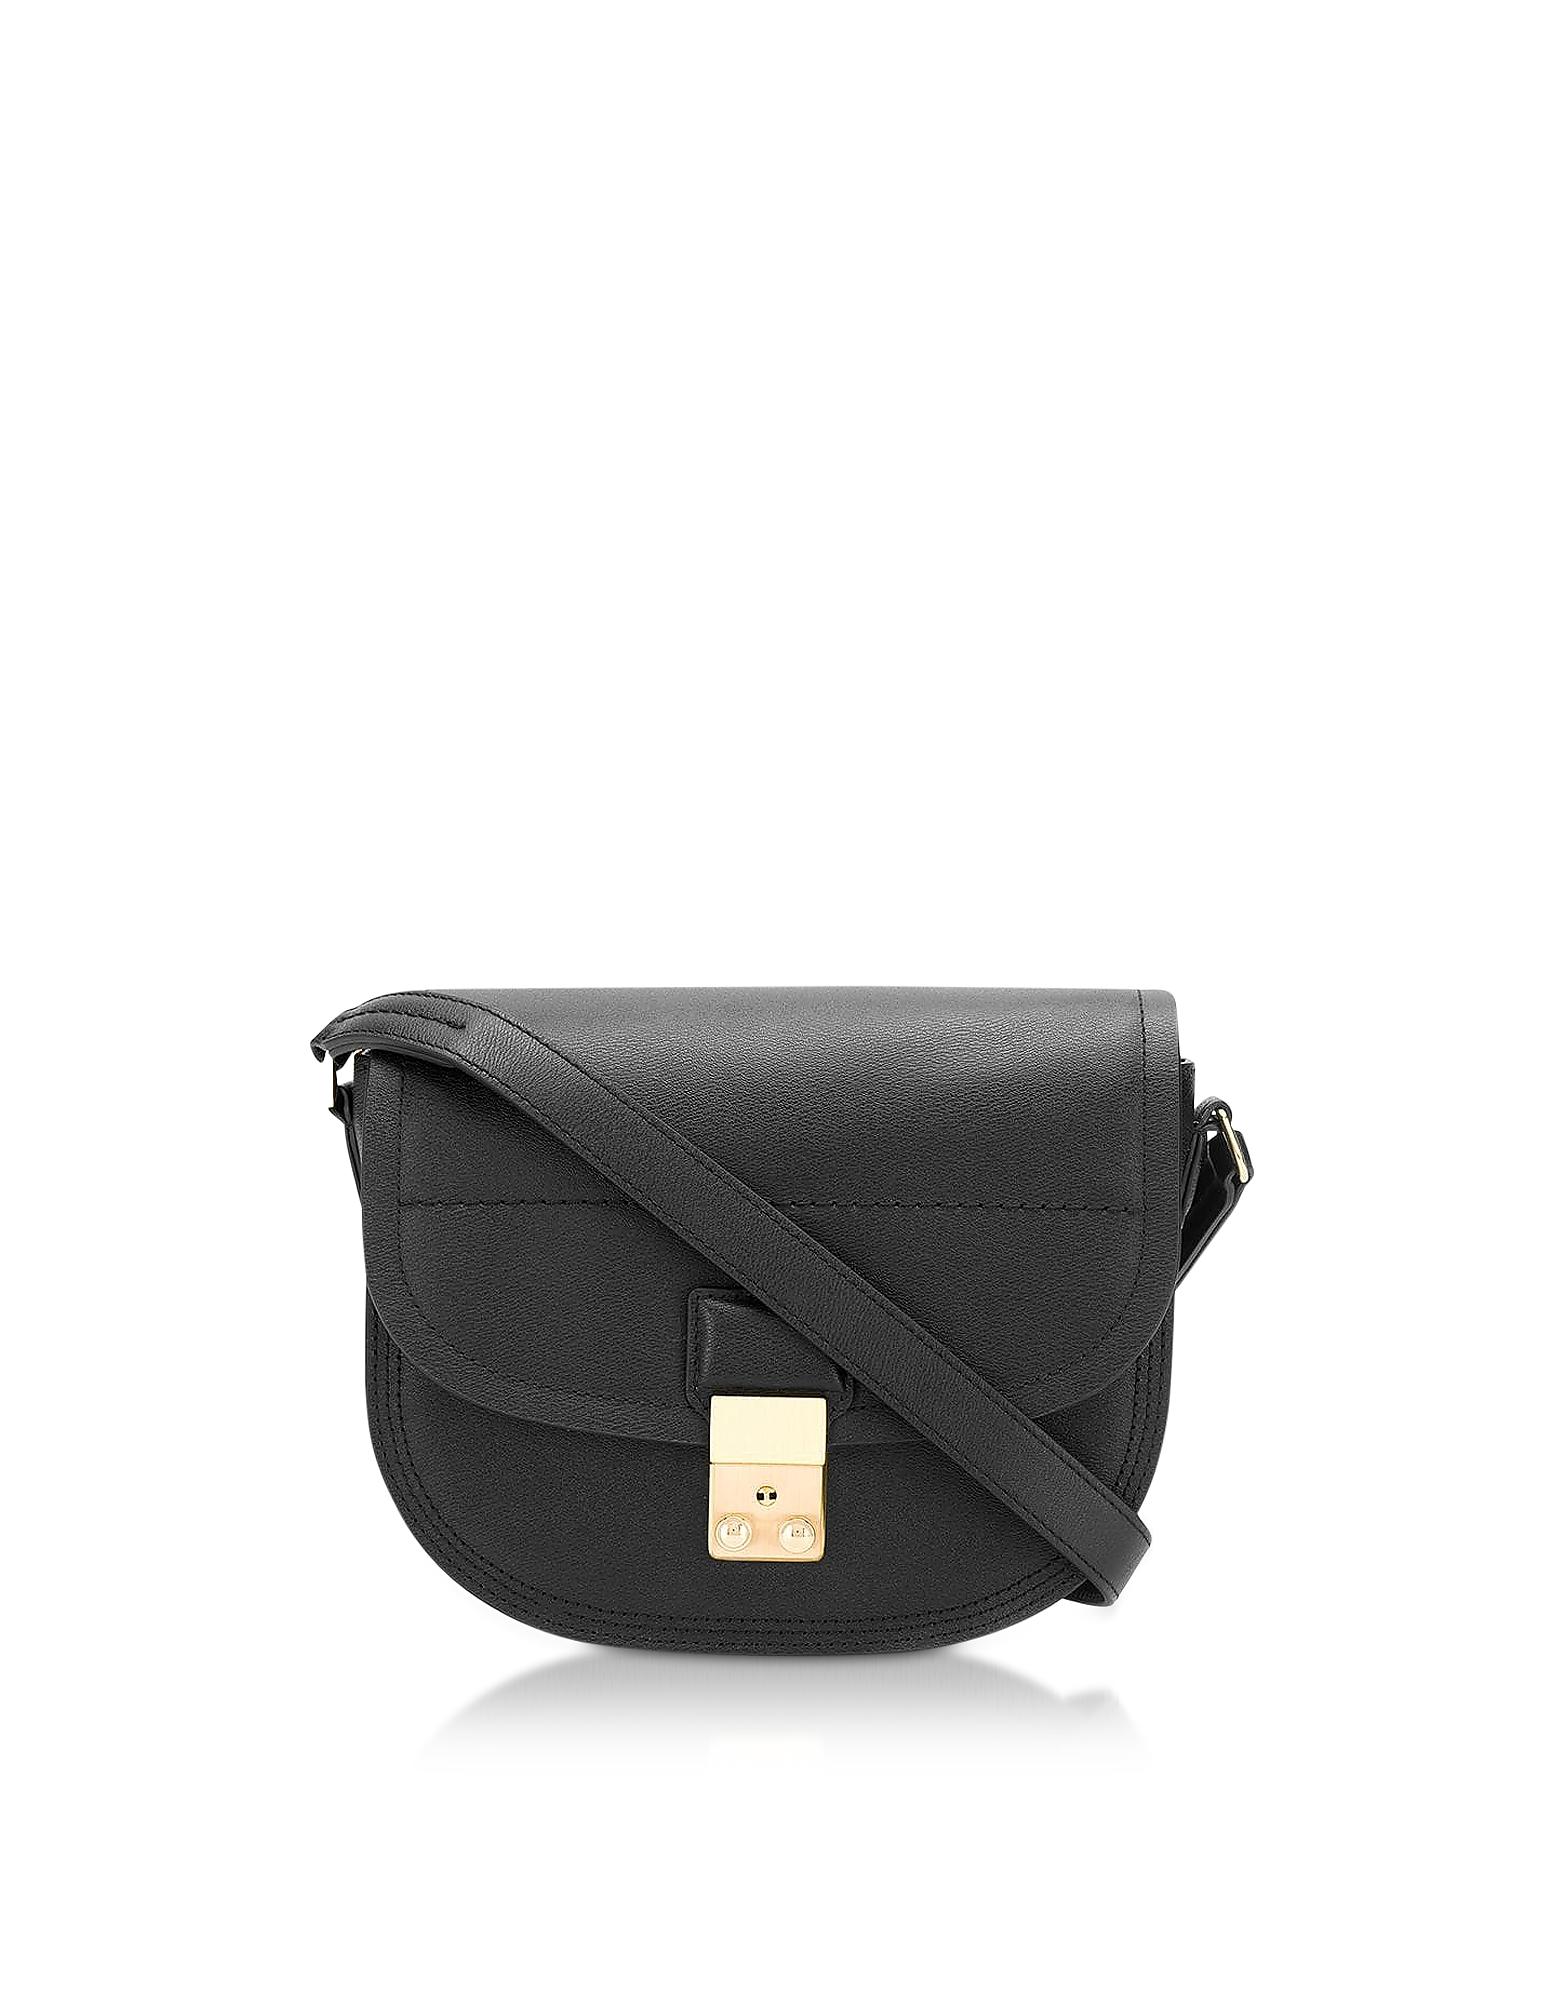 Pashli Saddle Bag, Black